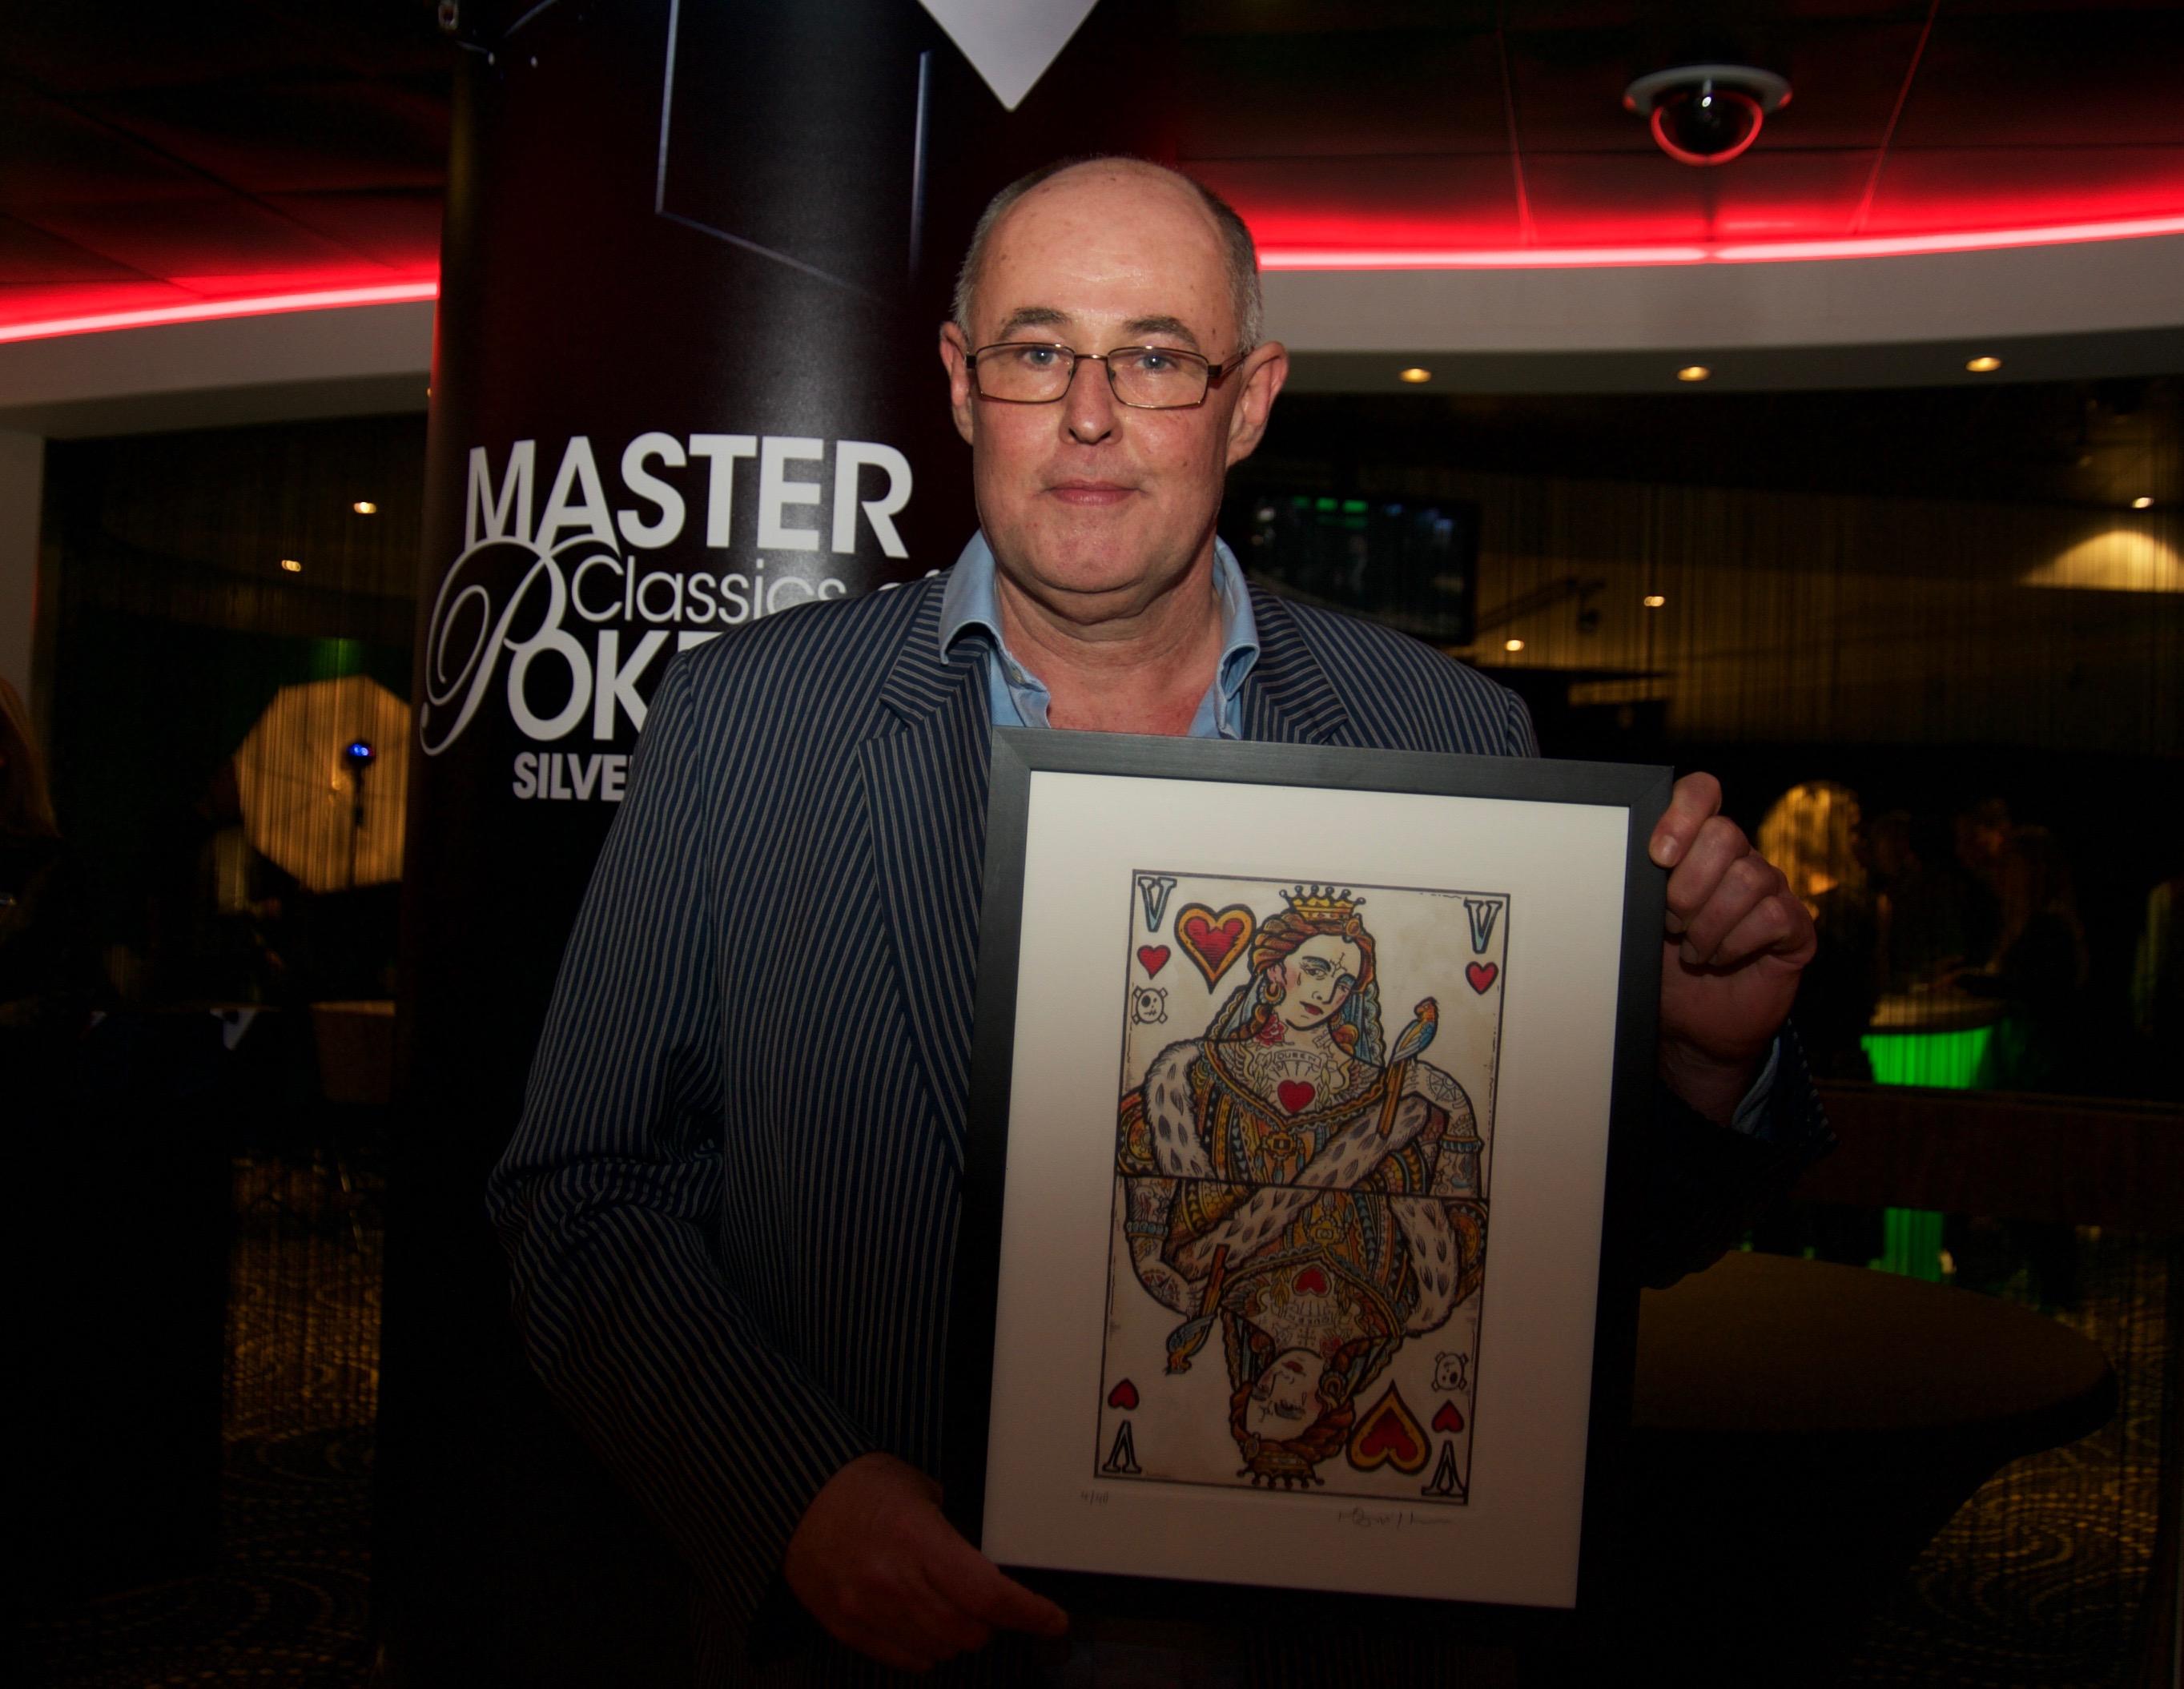 Rob Hollink, Lex Veldhuis en Peter Voolstra opgenomen in de Nederlandse Poker Hall of Fame 102